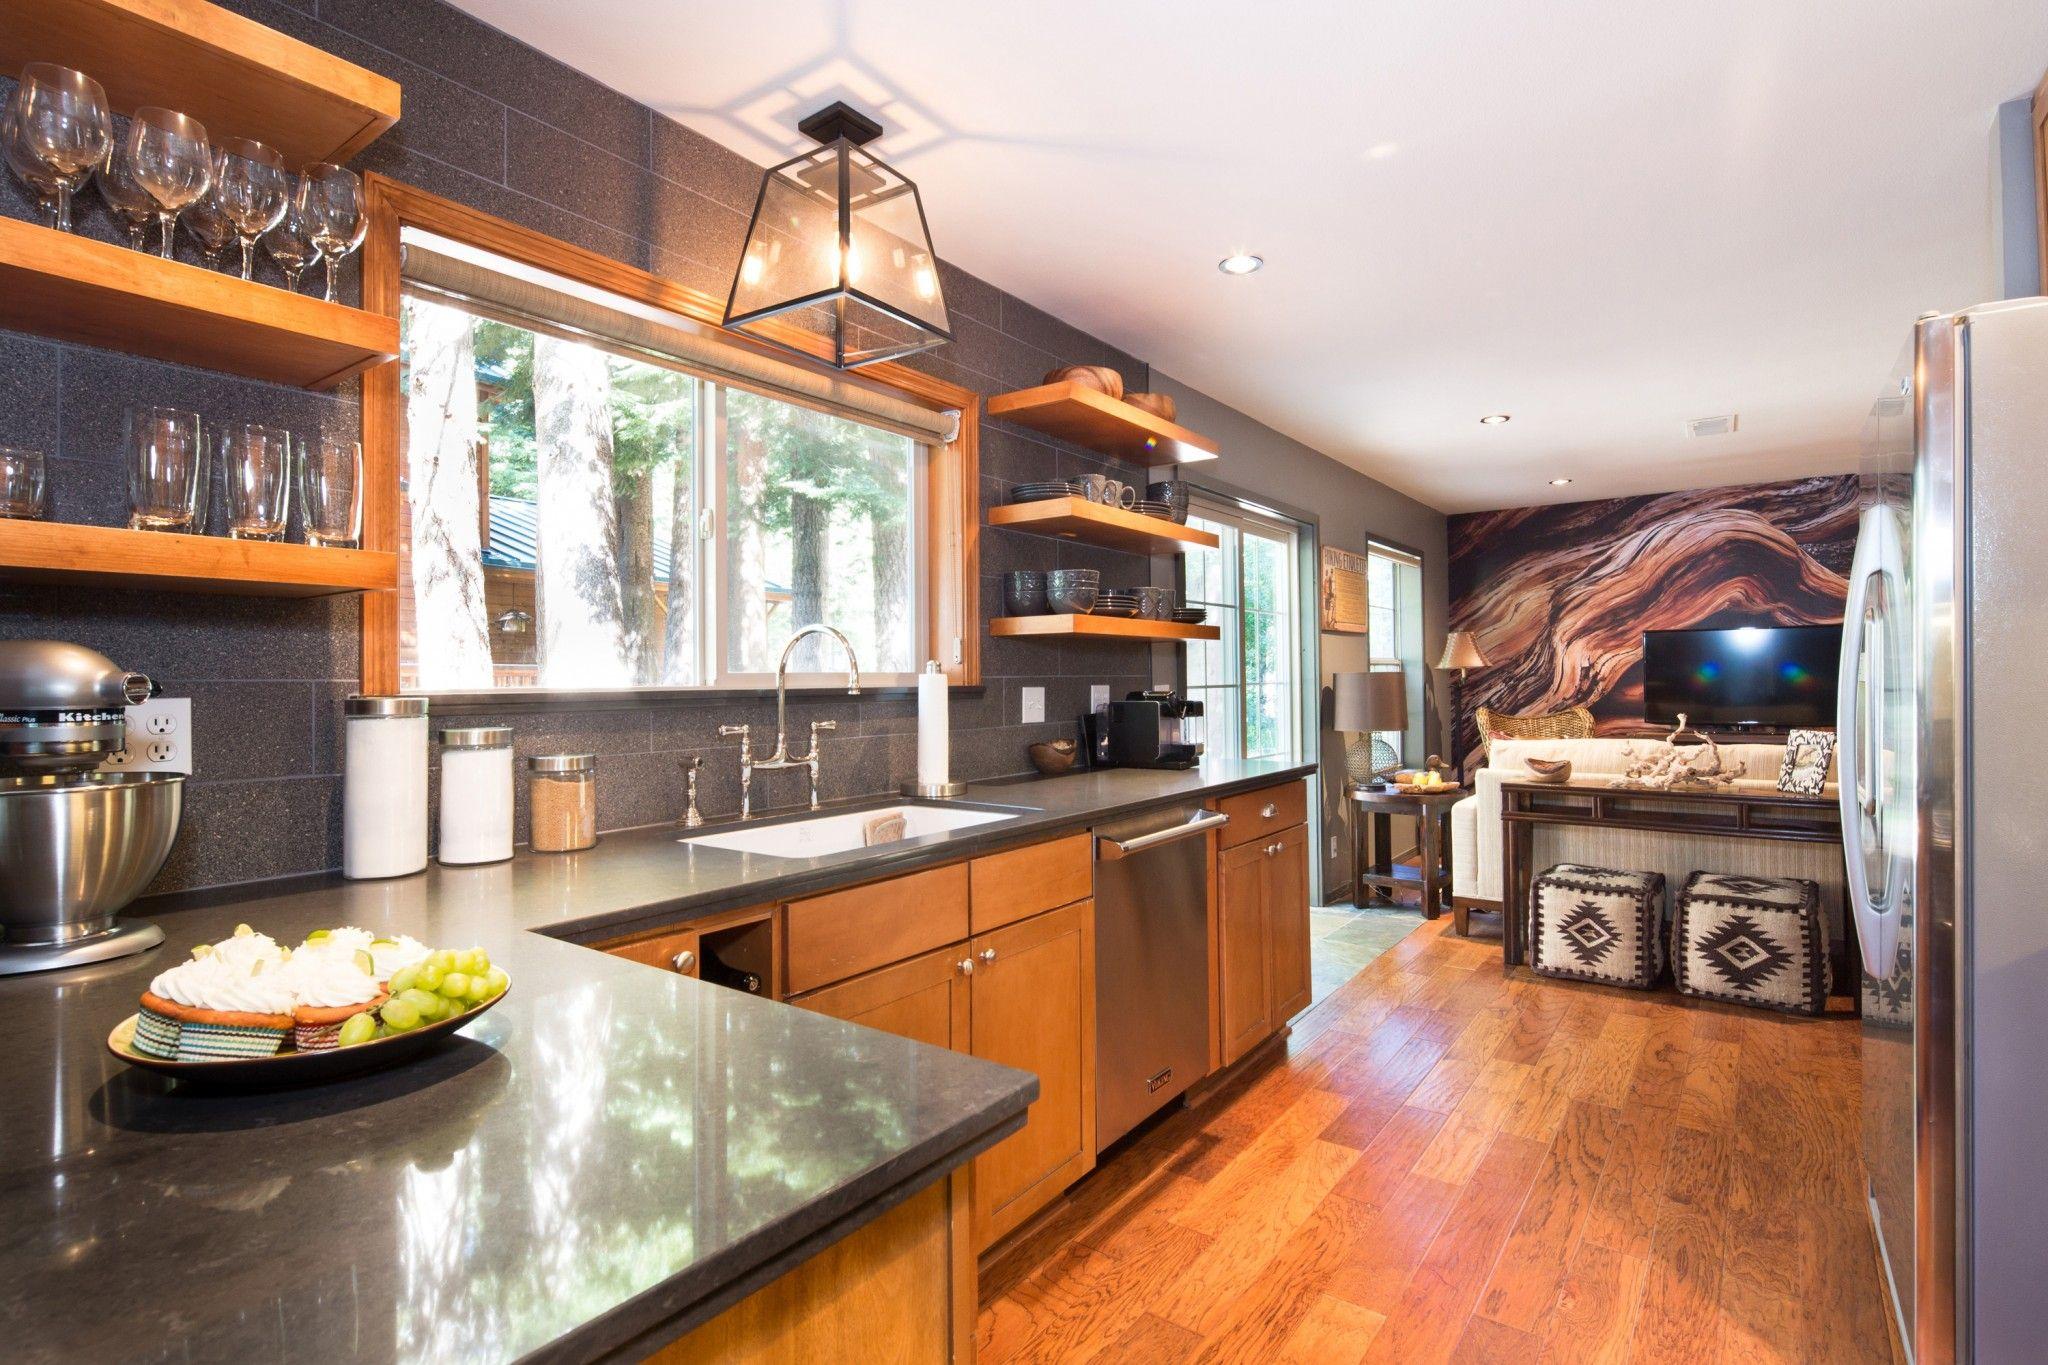 Choosing Best Kitchen Tile Ideas. Futuristic and laconic design